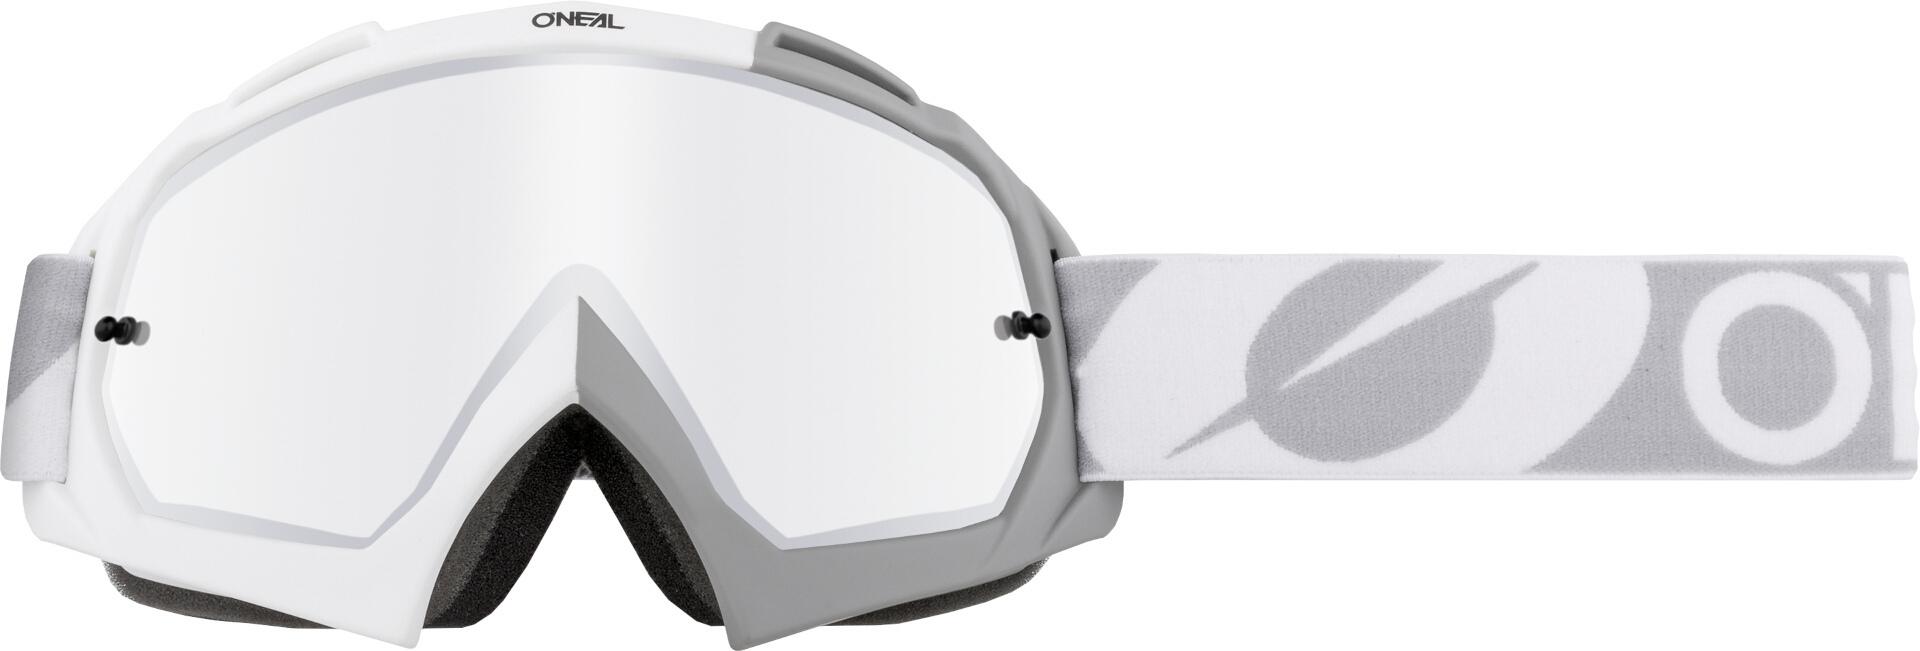 Oneal B-10 Twoface Silver Mirror Motocross Brille, grau-weiss, grau-weiss